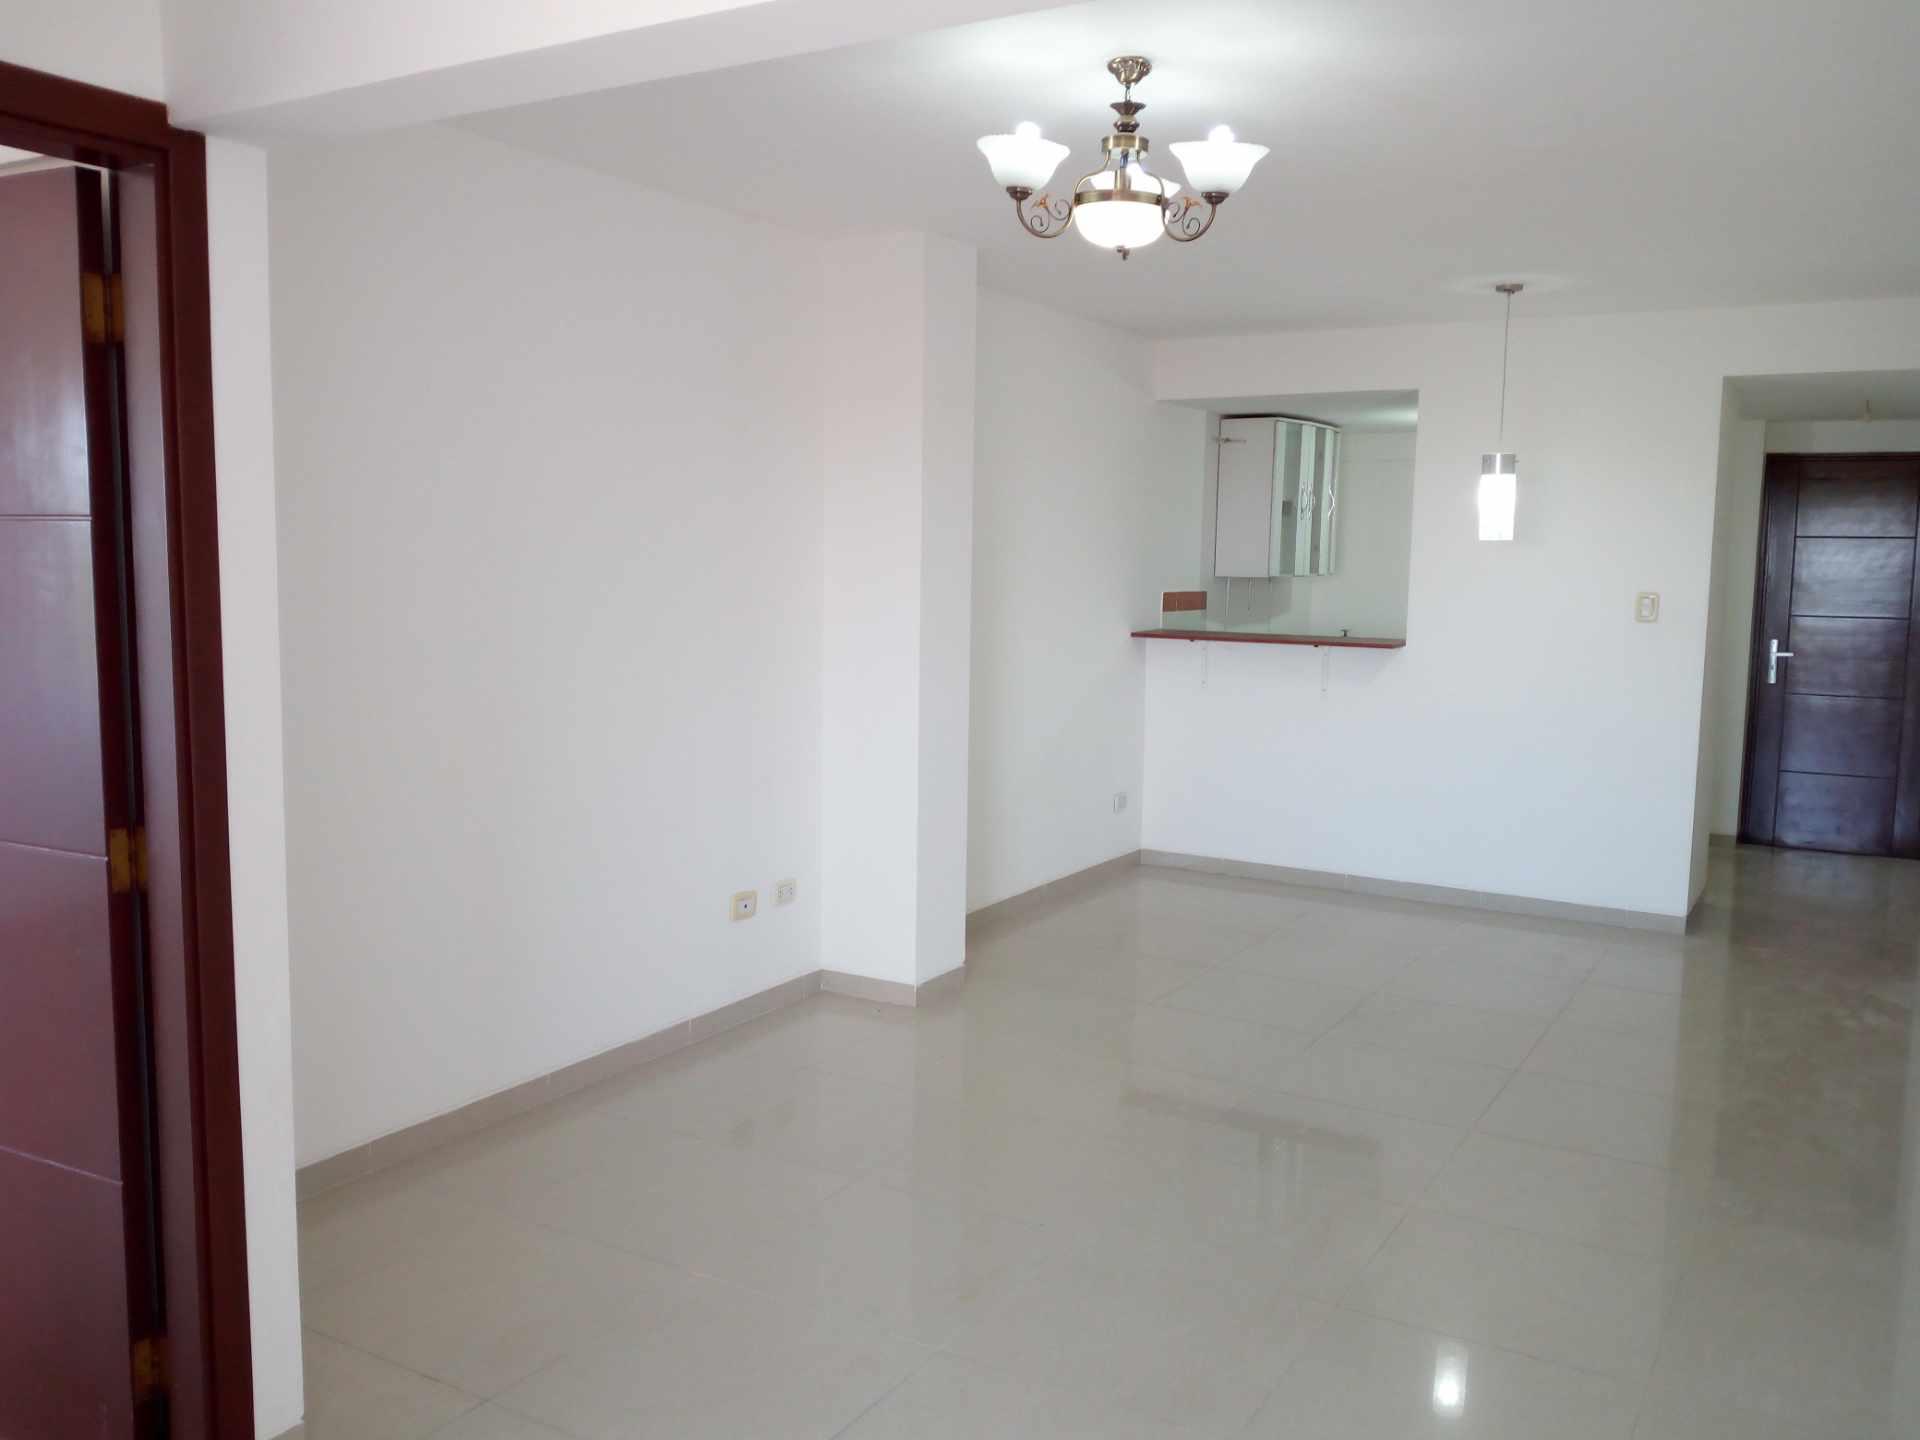 Departamento en Venta Entre 3er y 2do Anillo, Av. Guapay (Canal Cotoca) Foto 2